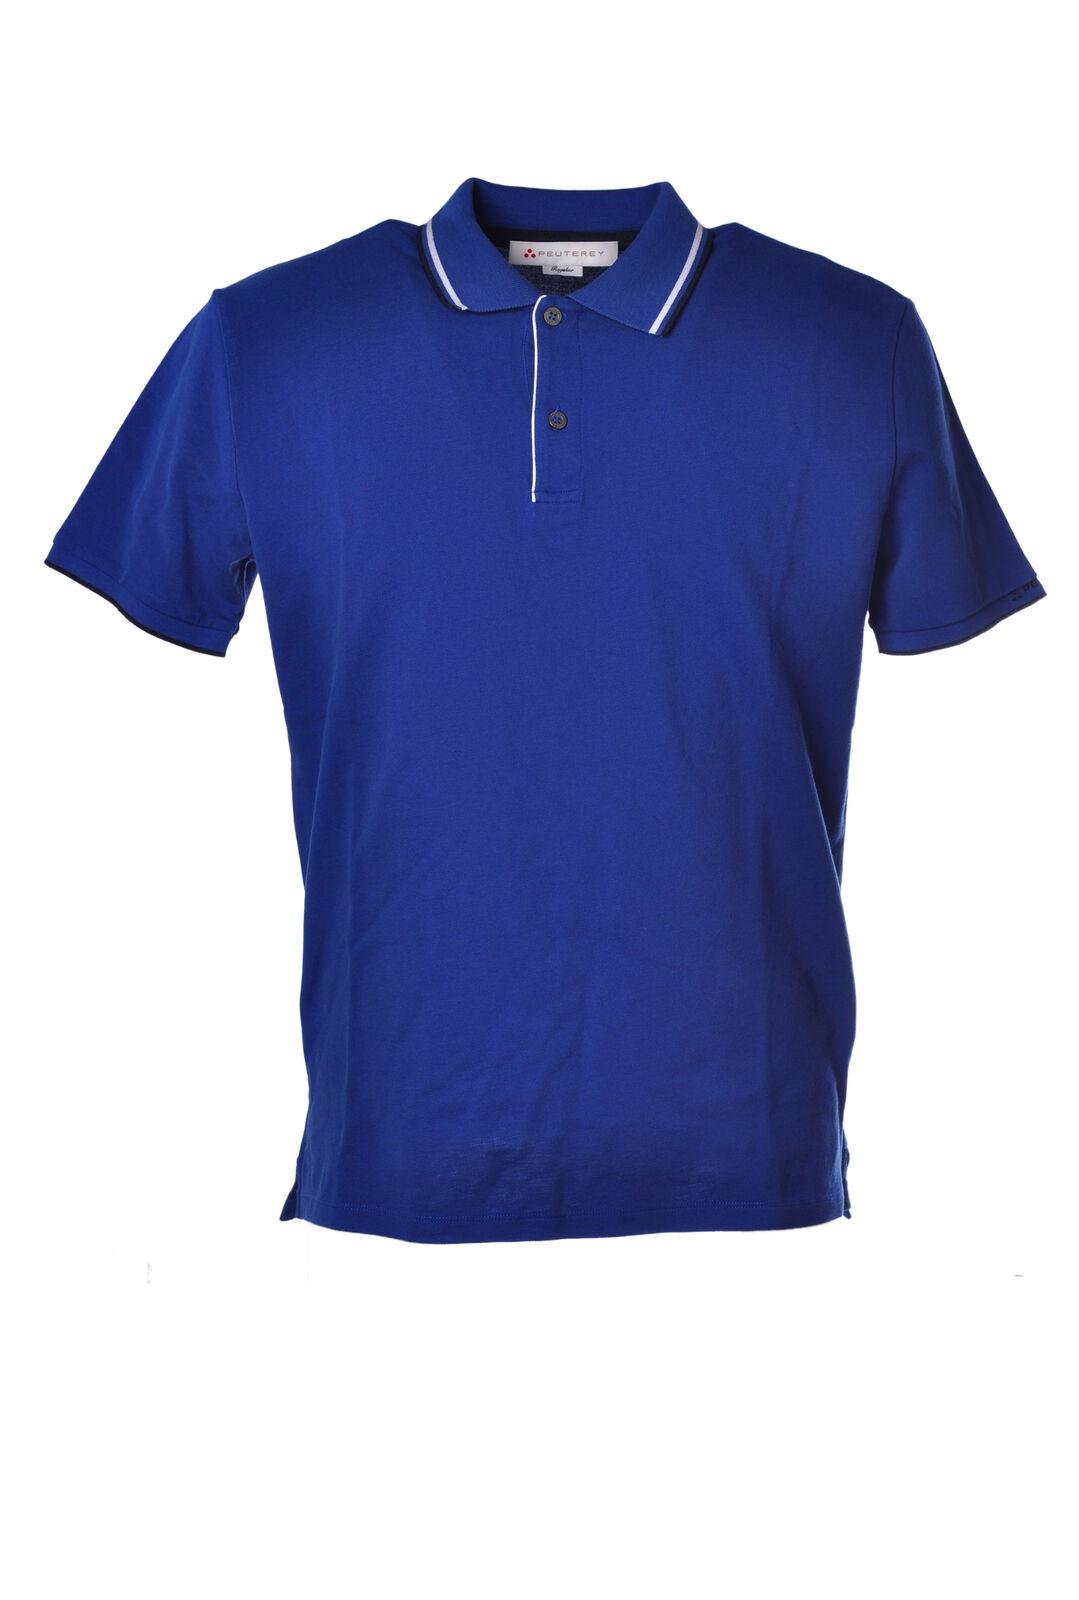 Peuterey  -  Polo - Male - bluee - 1839018A182256